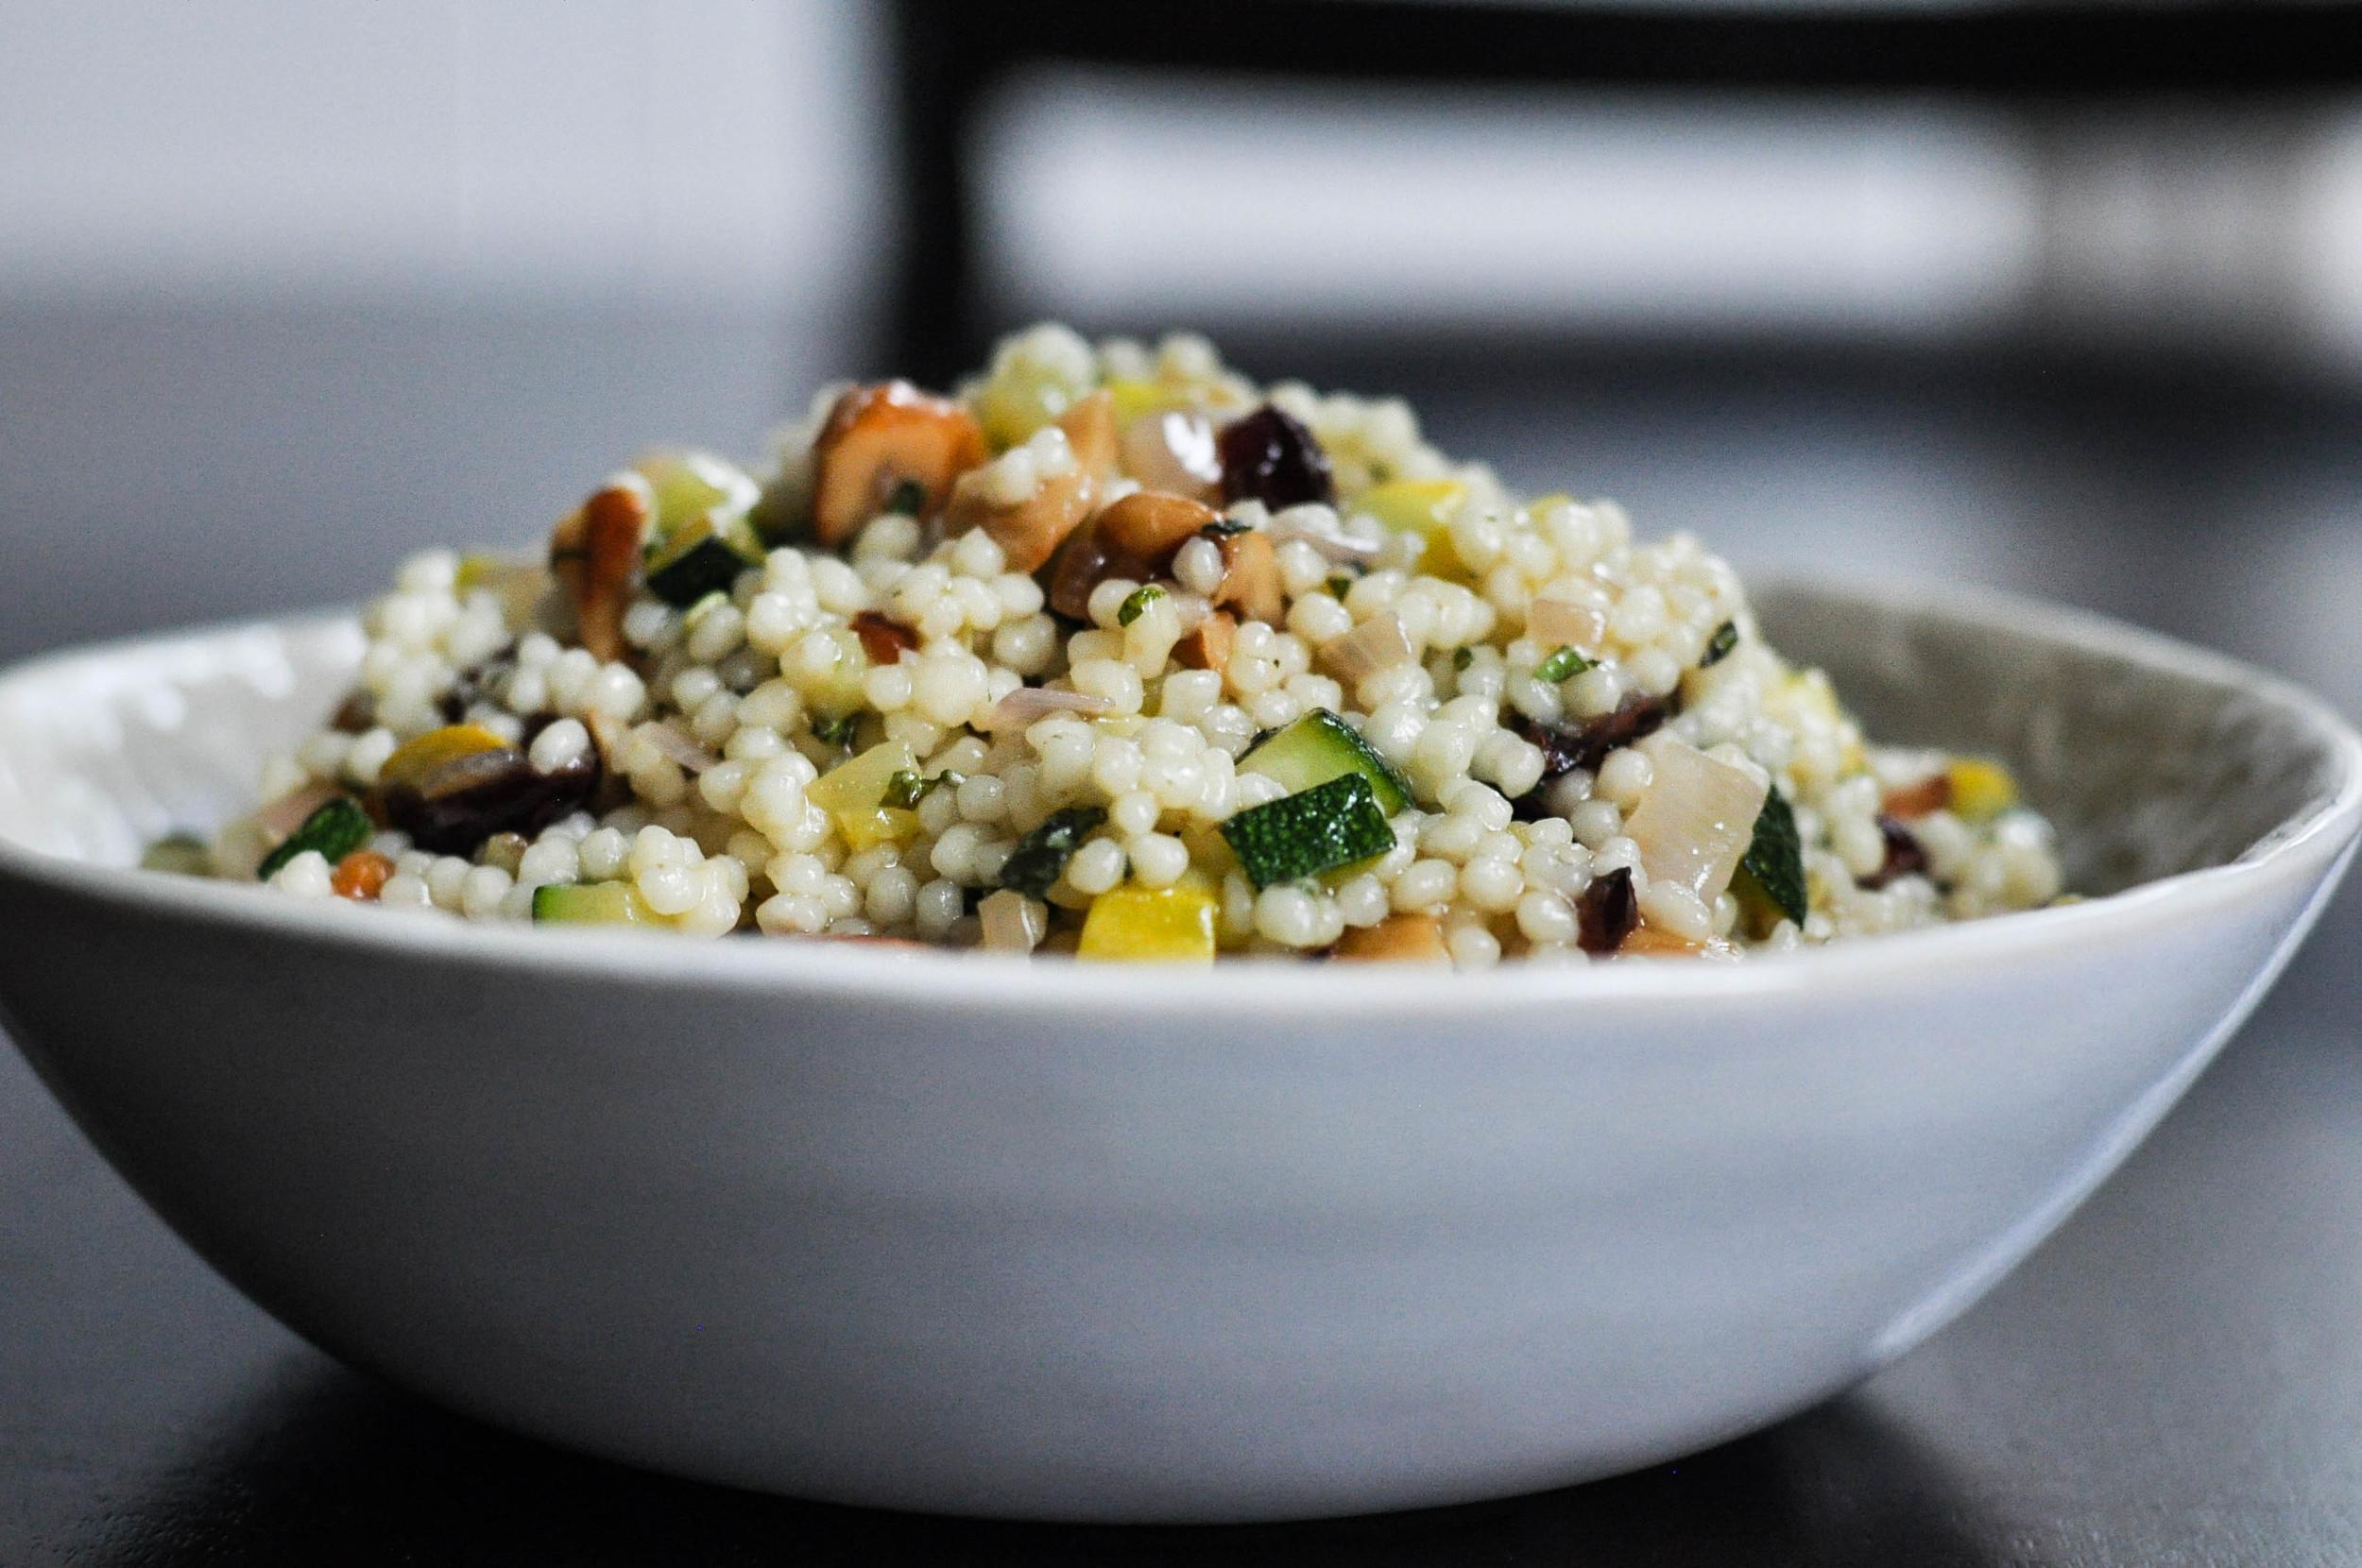 Couscous with Summer Squash & Roasted Garlic Vinaigrette | O&O Eats